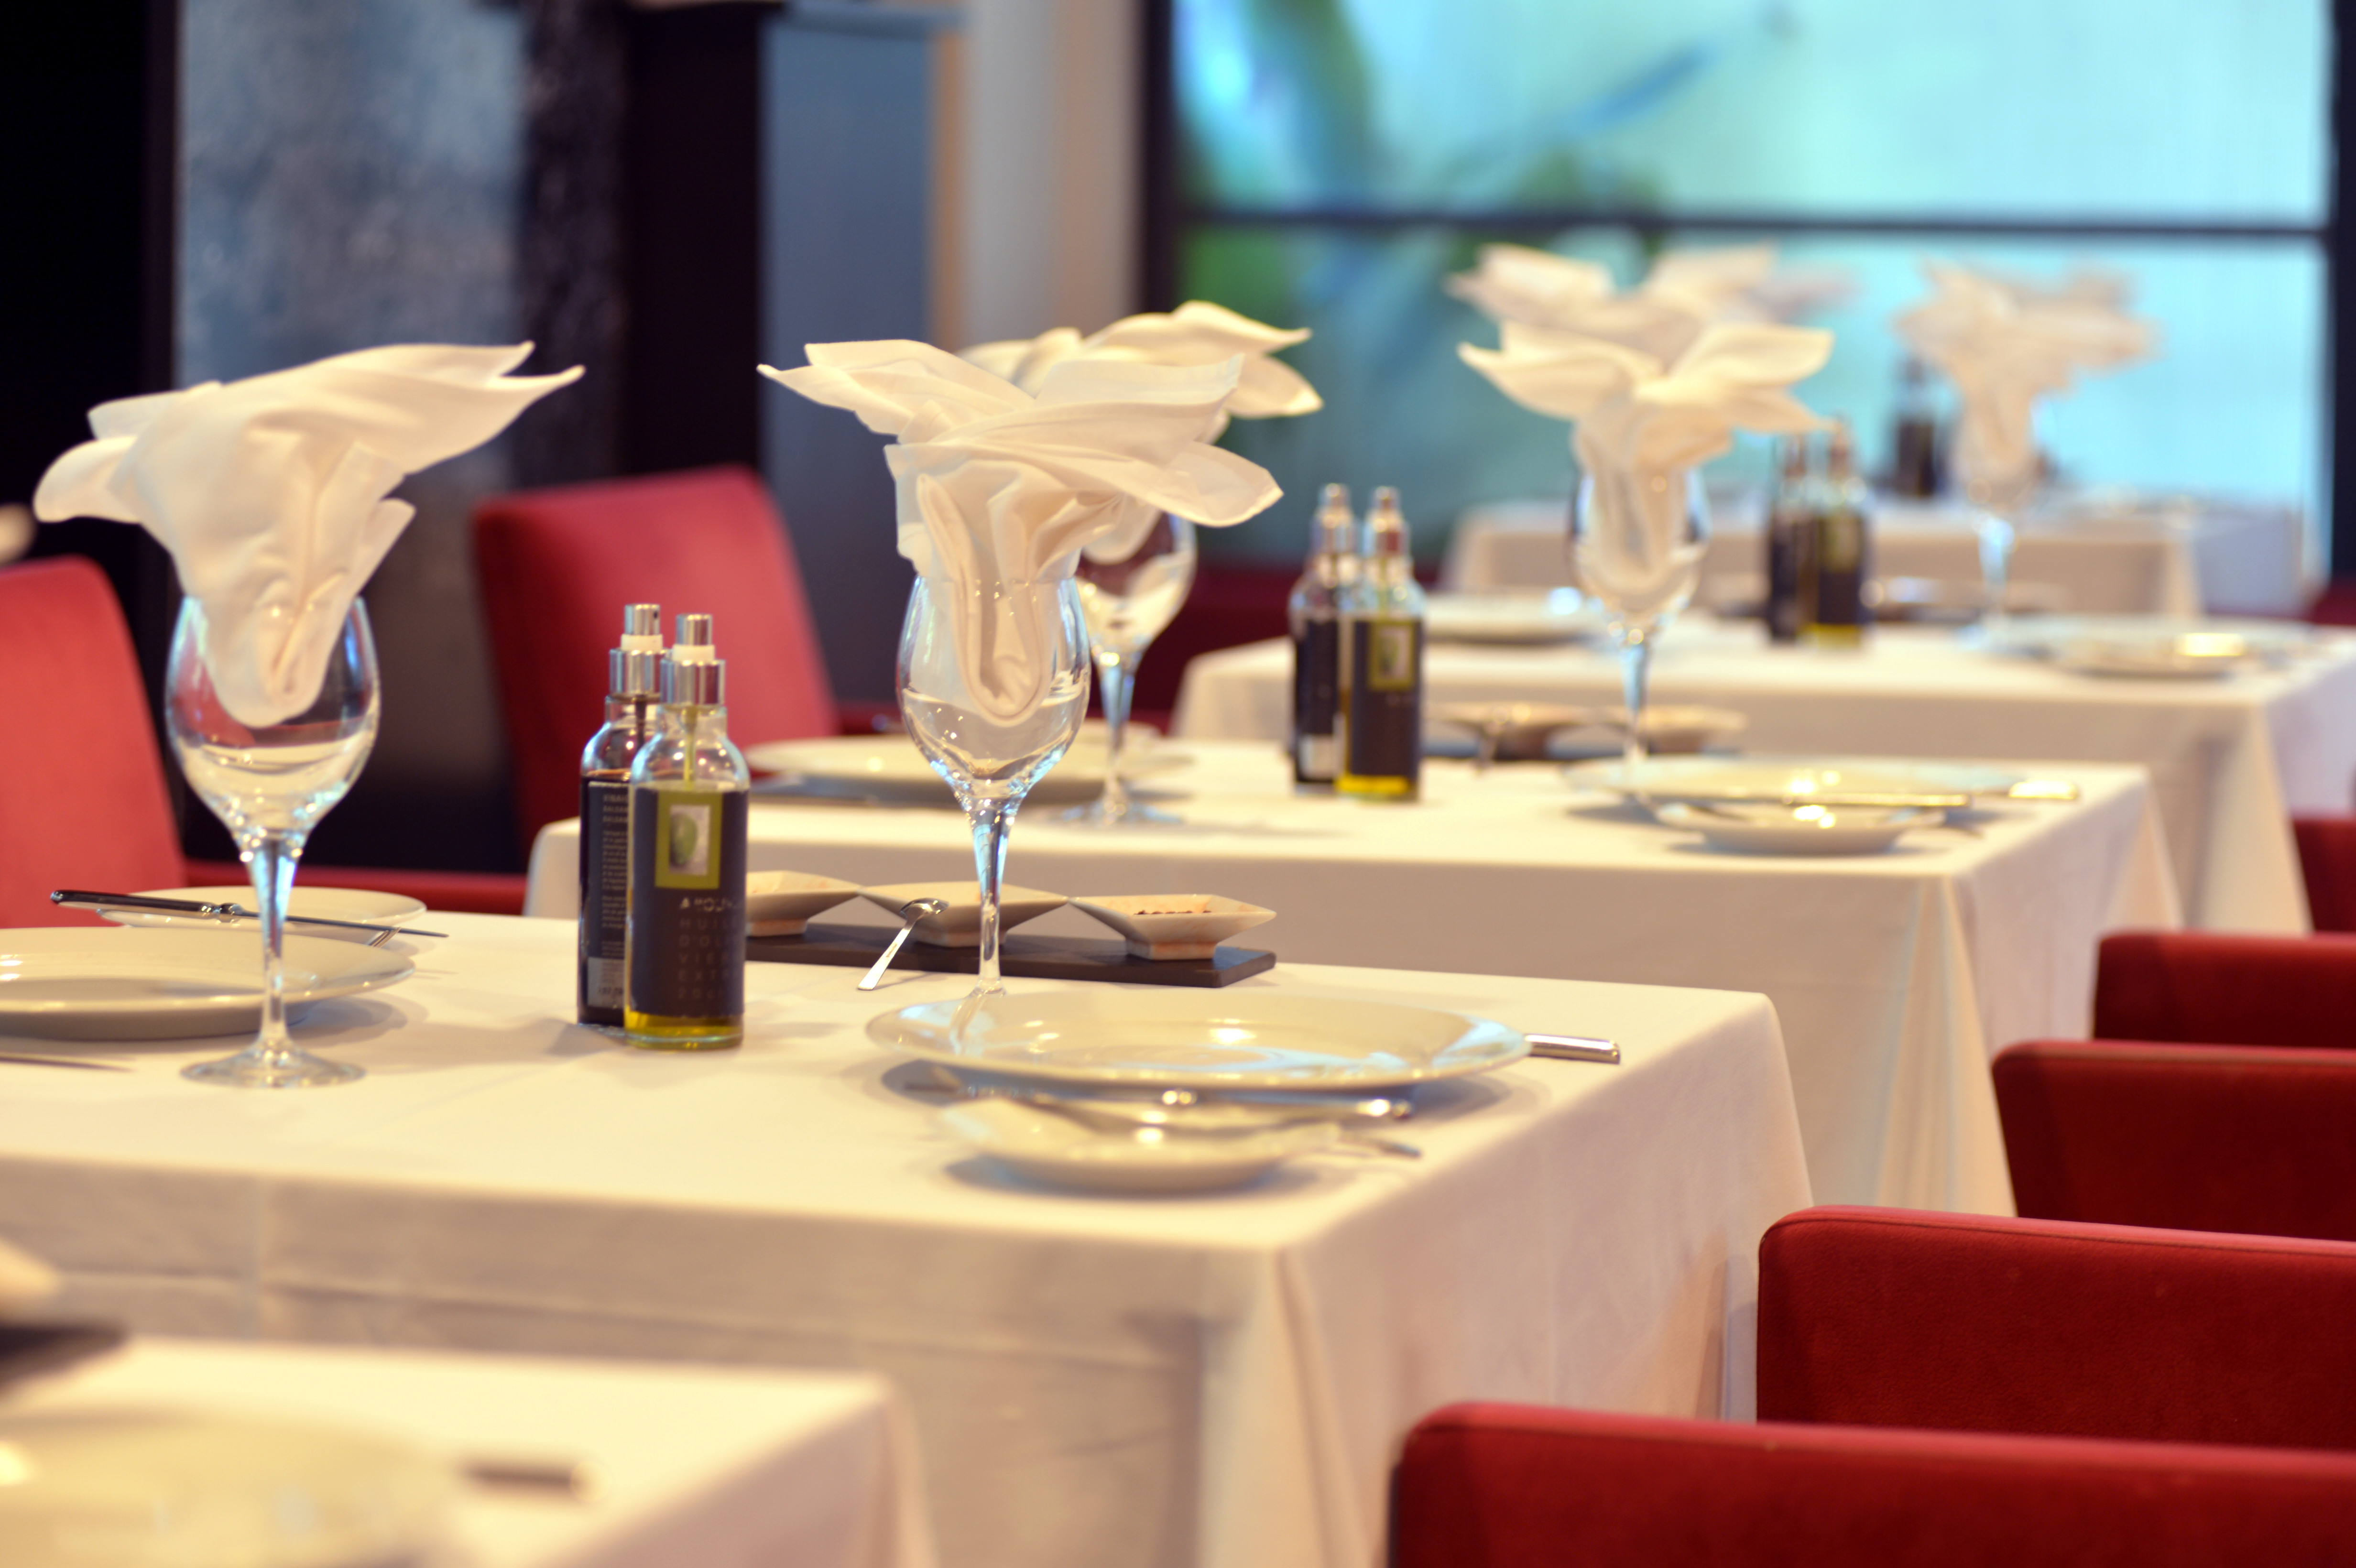 Manava suite resort tahiti recrute chef de cuisine for Offre emploi chef de cuisine